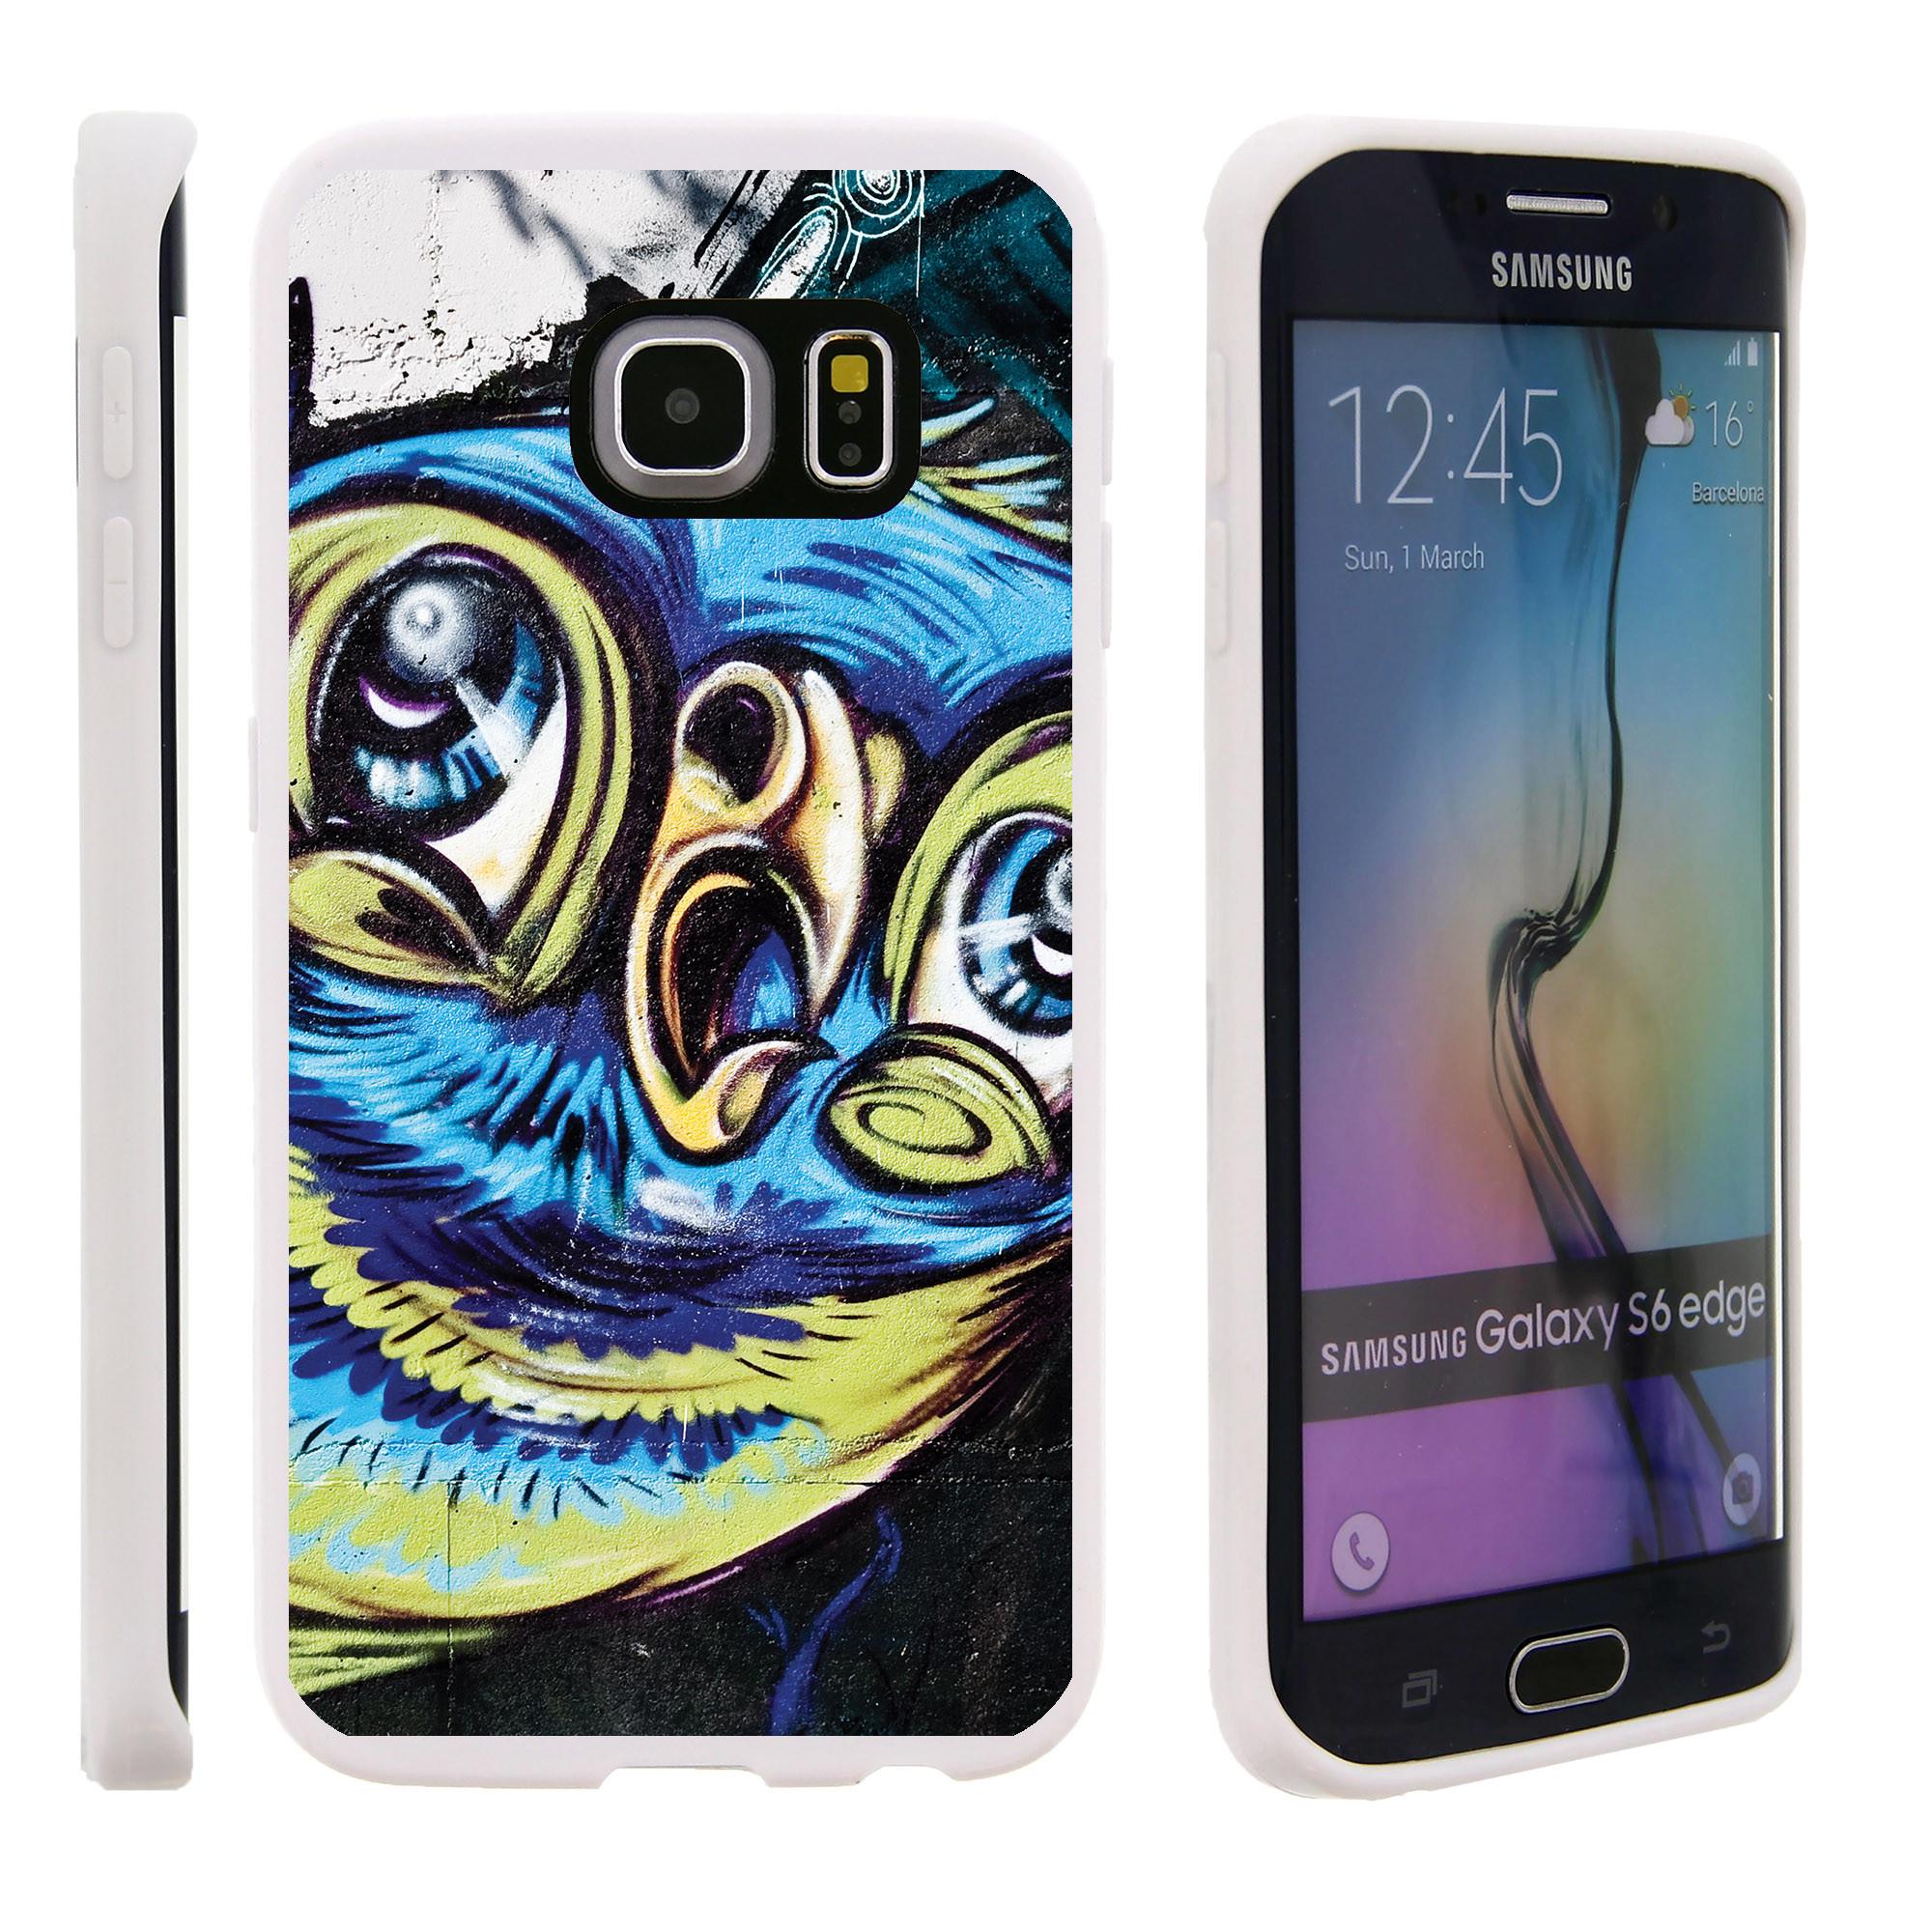 Samsung Galaxy S6 Edge G925, Flexible Case [FLEX FORCE] Slim Durable TPU Sleek Bumper with Unique Designs - Colorful Pigeon